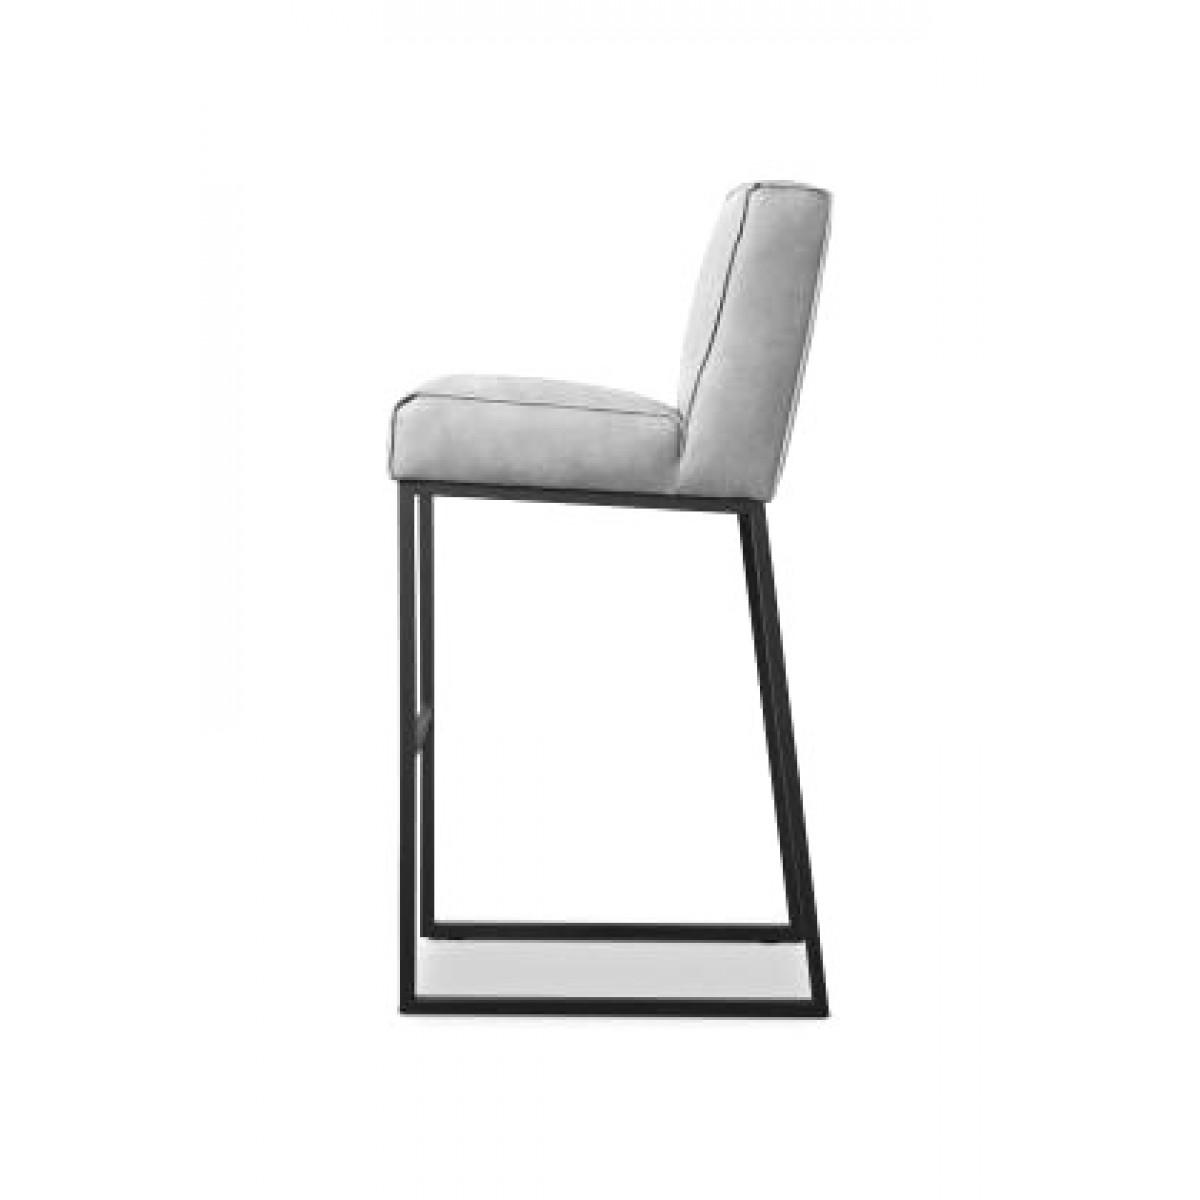 barkruk-barhocker-stool-het-anker-lara-miltonhouse-zijkant